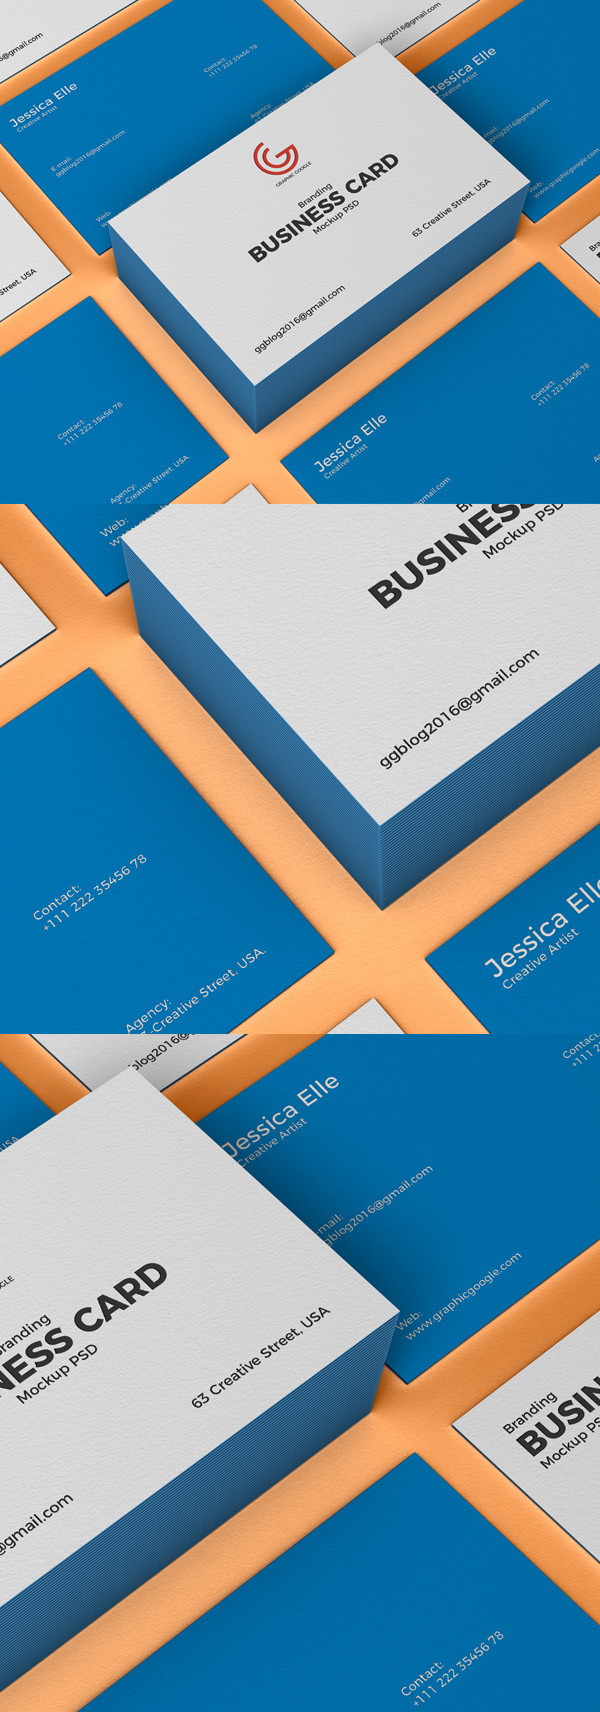 Freebies for 2019: Free Branding Business Card Mockup